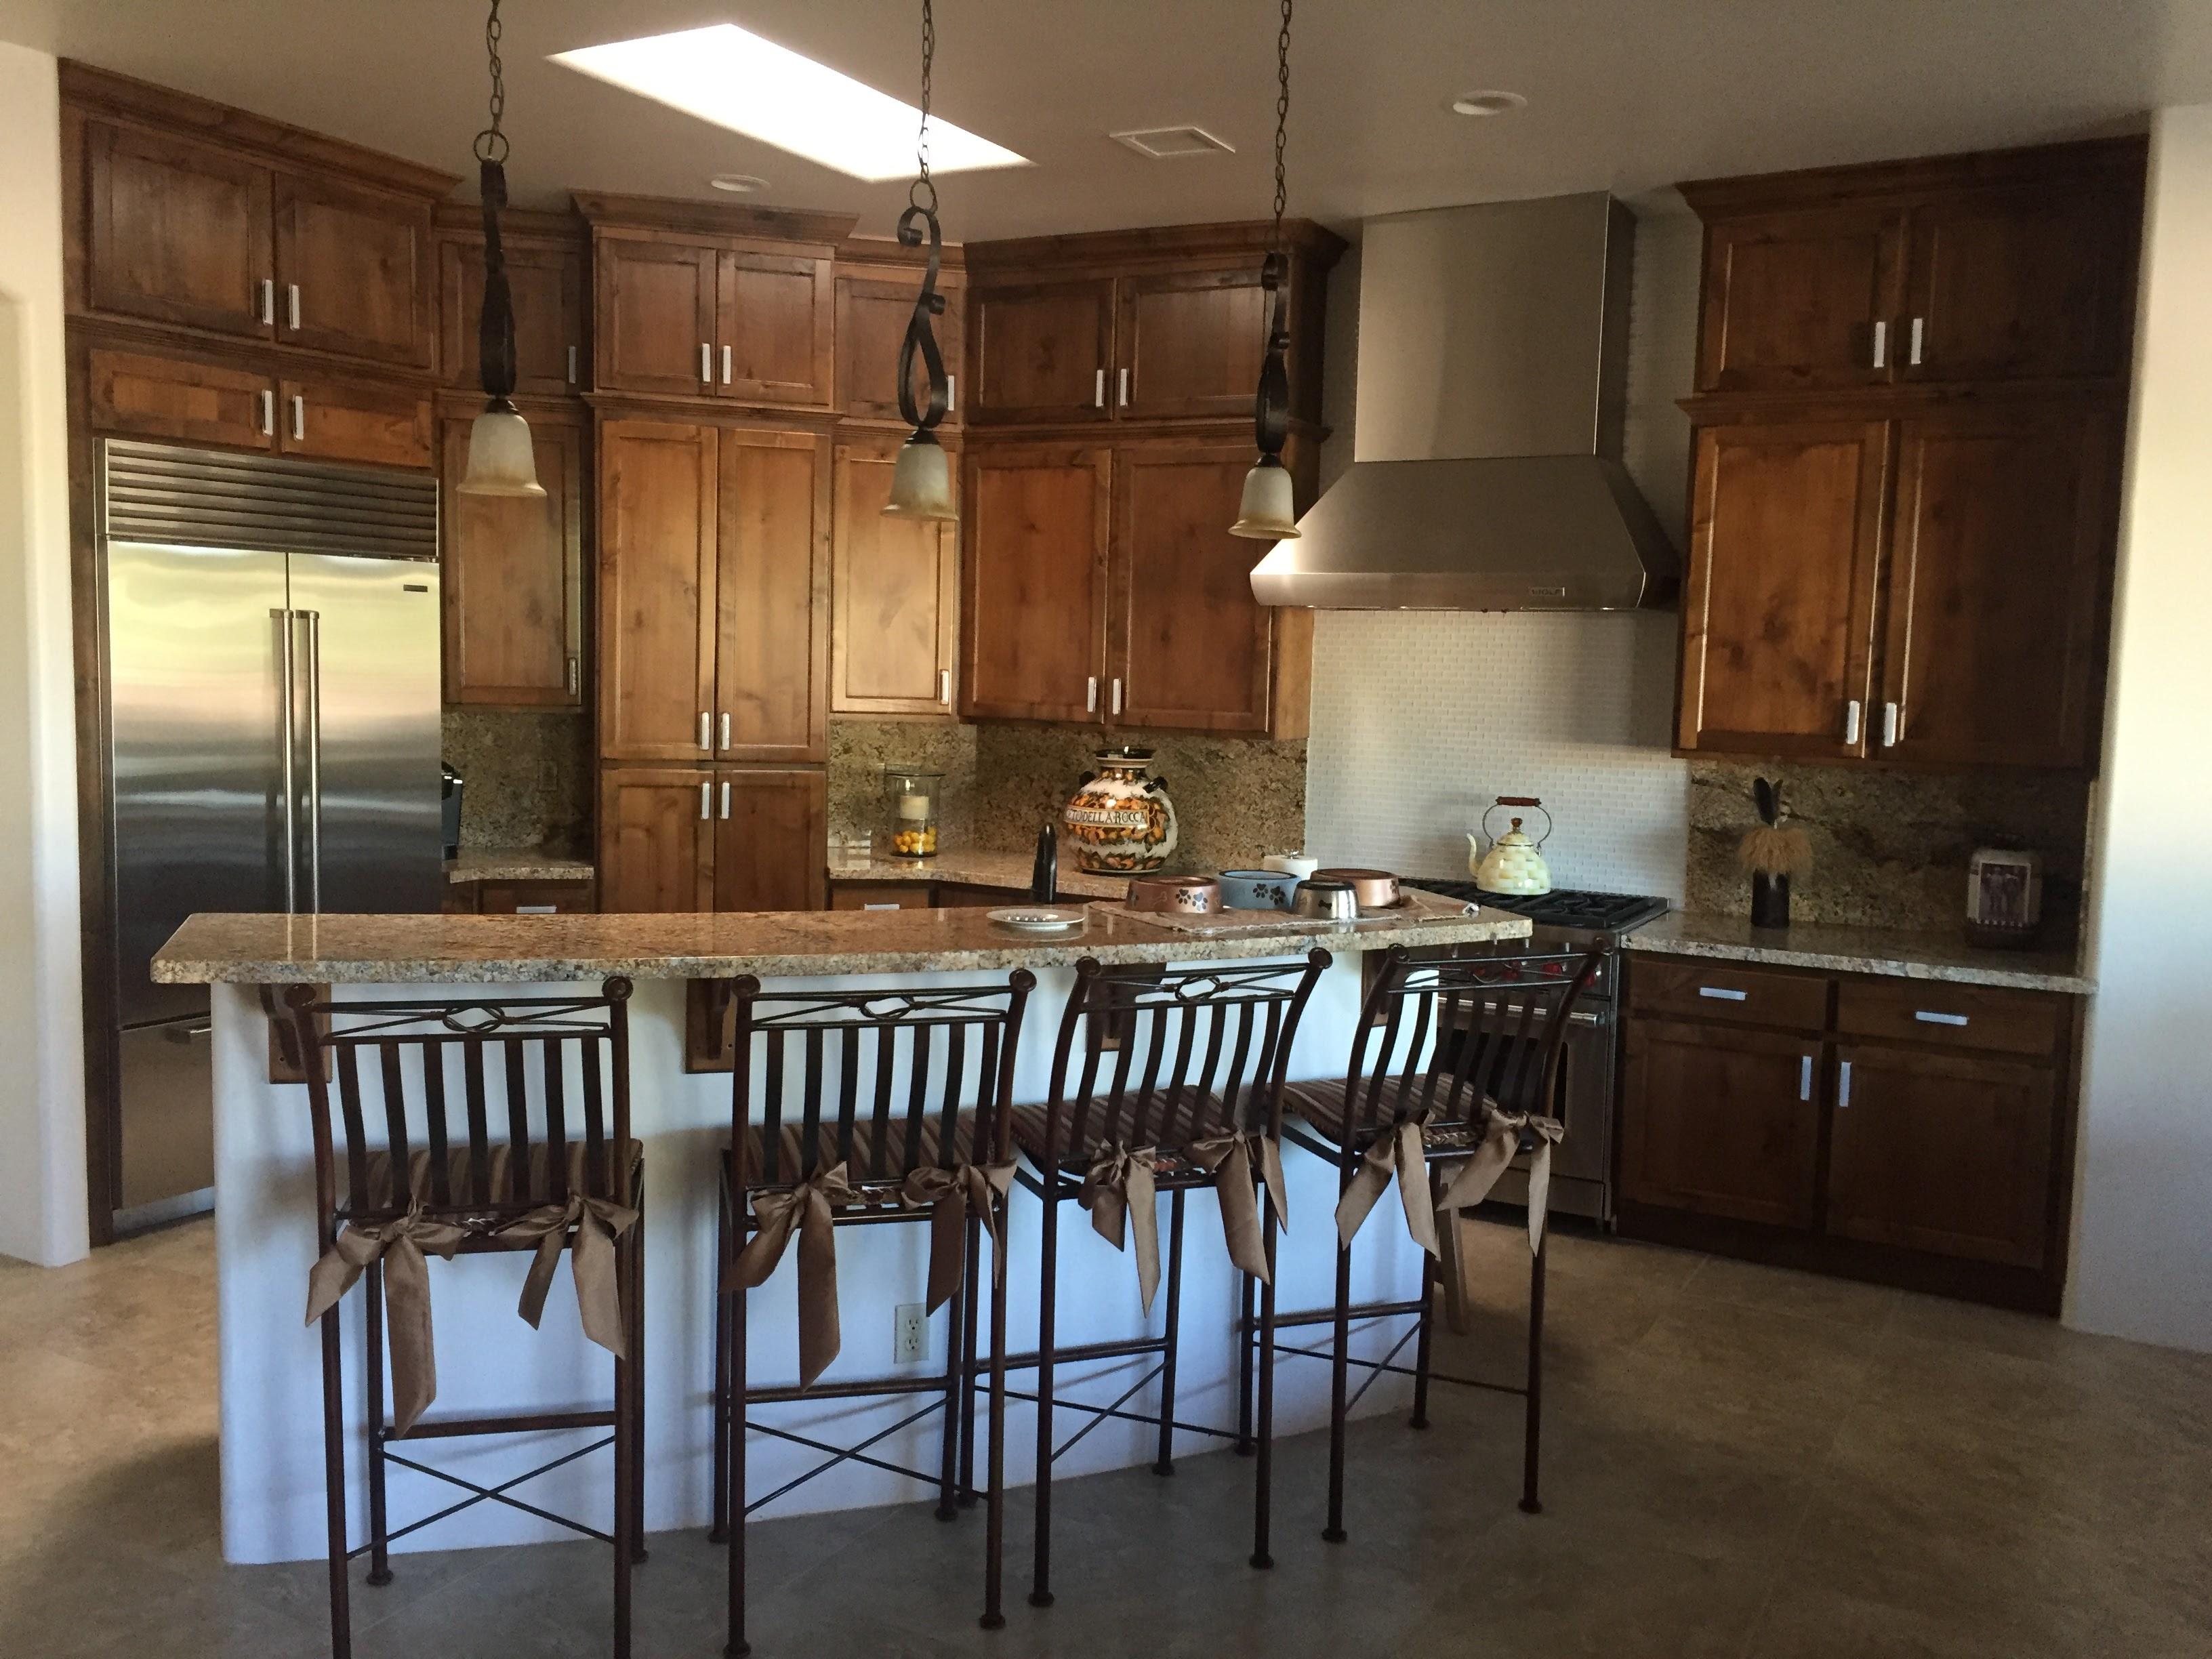 86 Dining Room Sets Nj American Made Downloadamerican  : 14528 Gaber Kitchen 2 from pakngoshome.com size 3264 x 2448 jpeg 1133kB